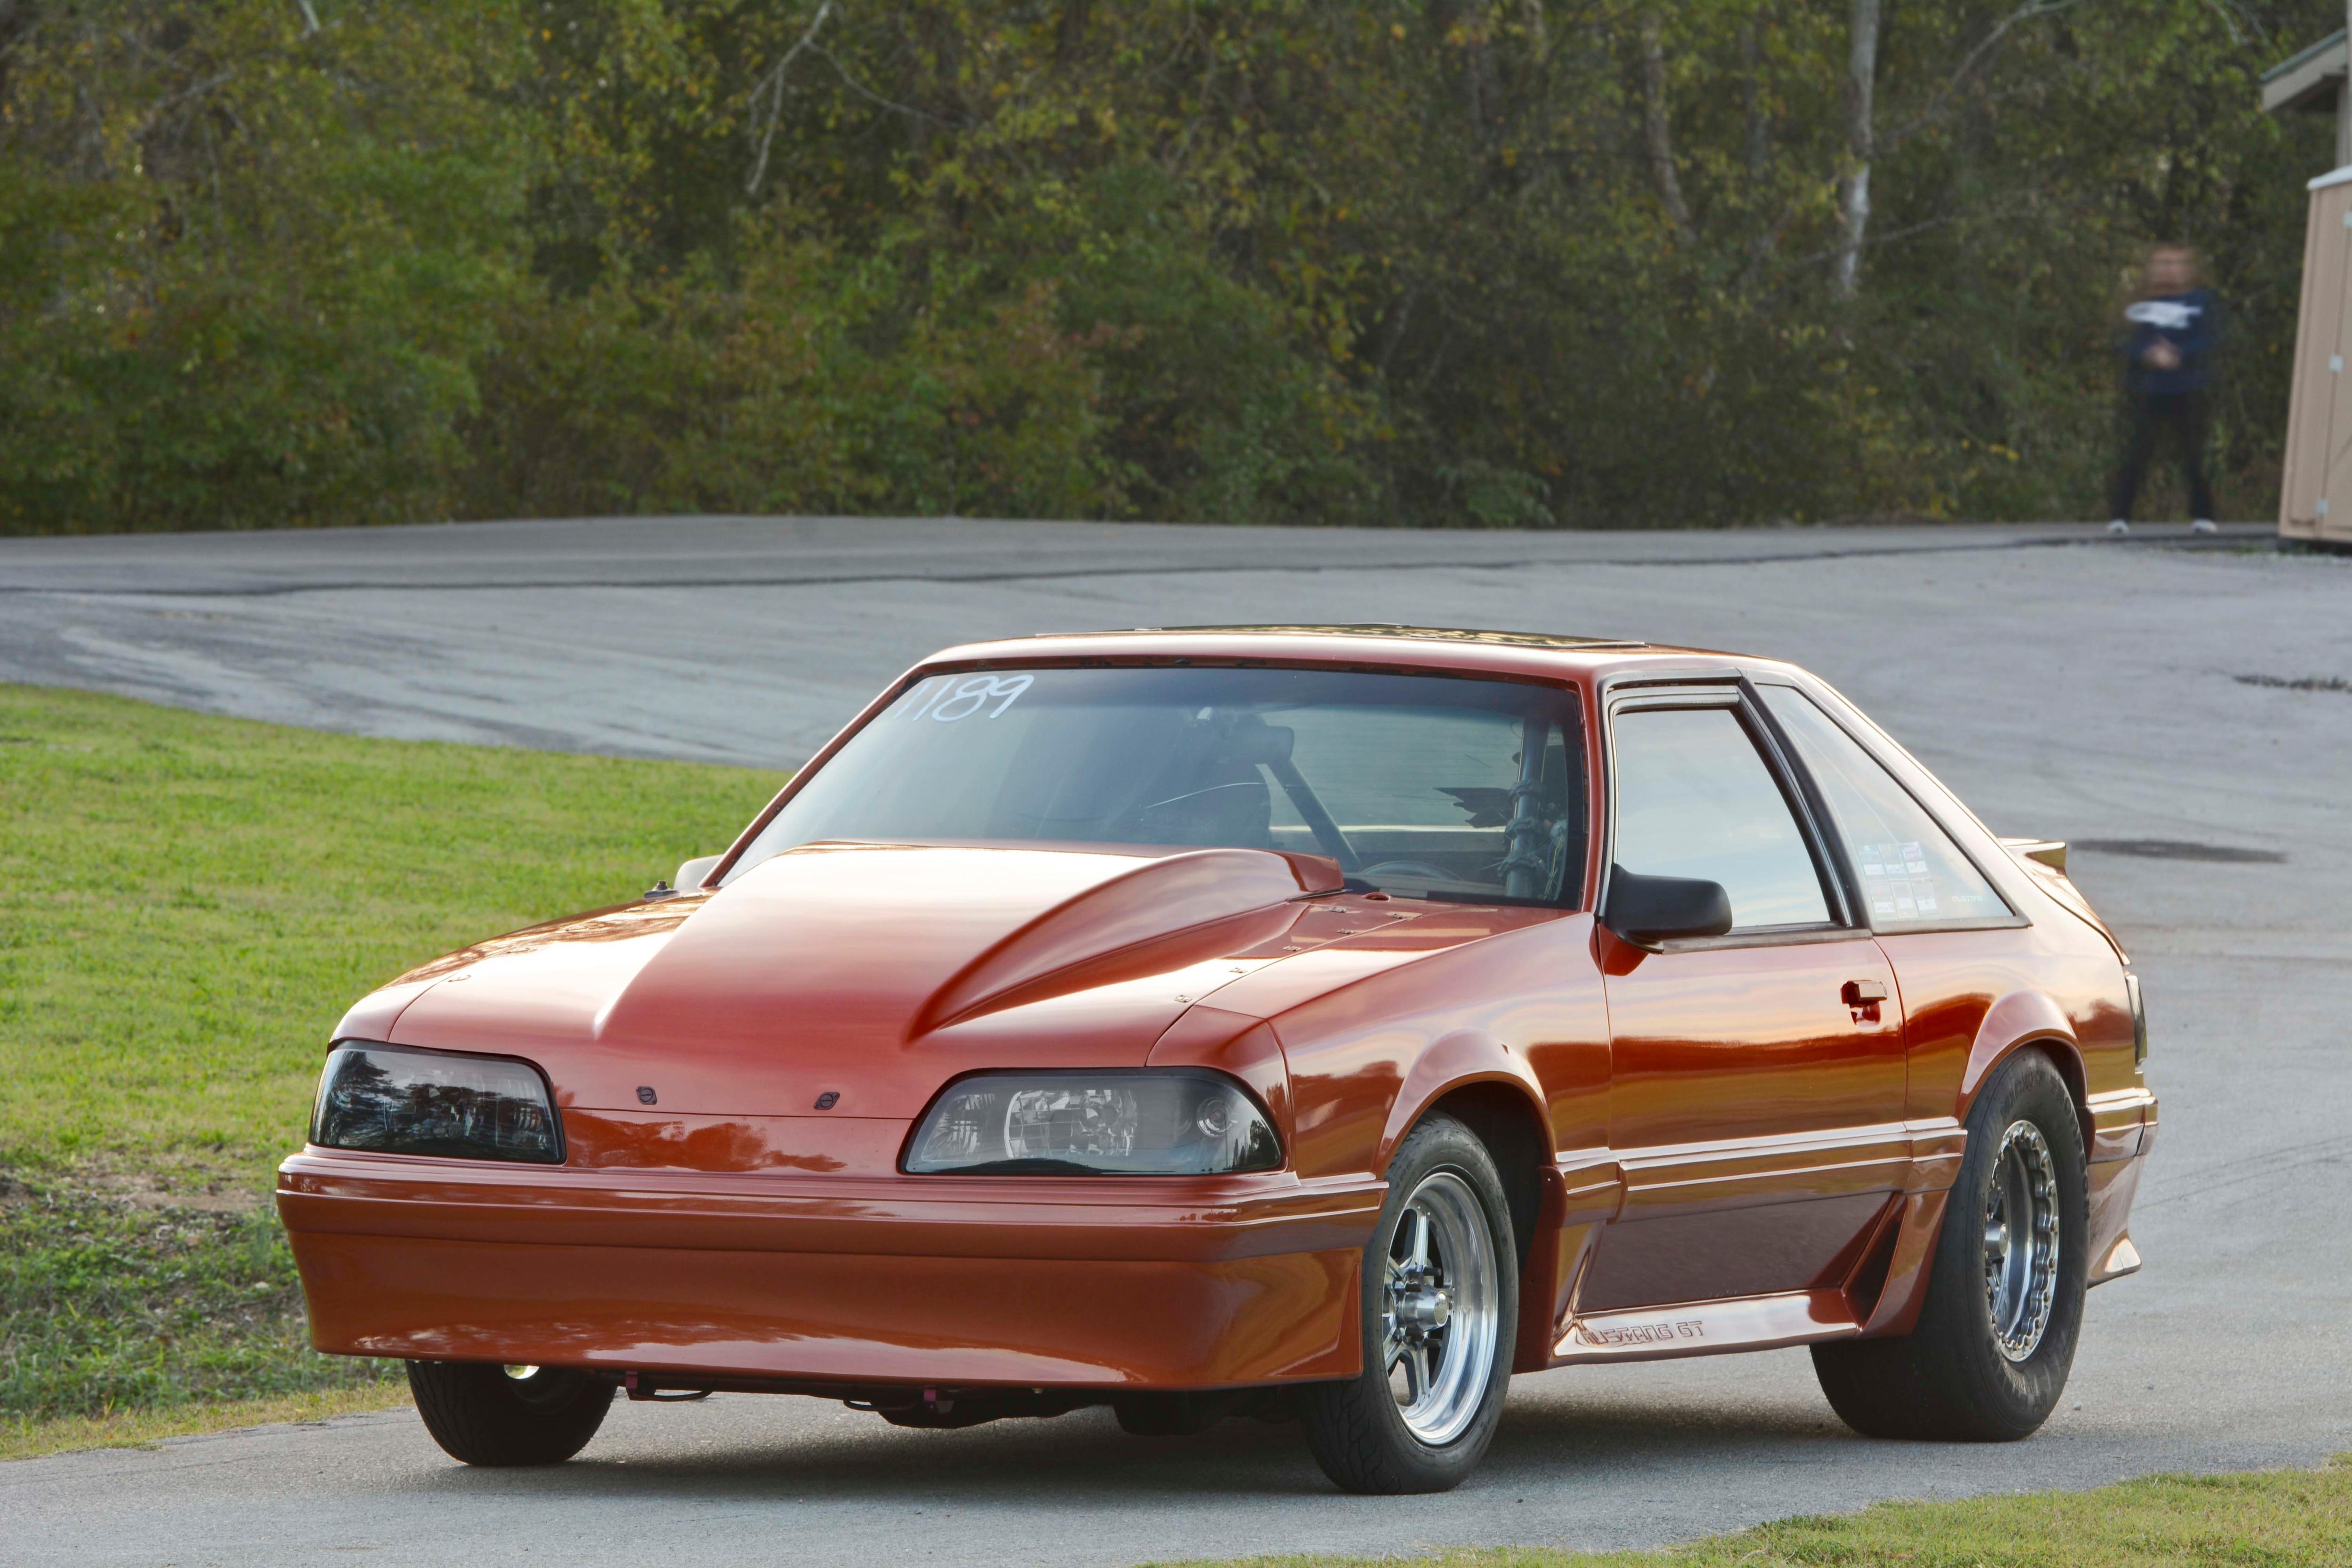 027 Orange Procharged Mustang Overalls